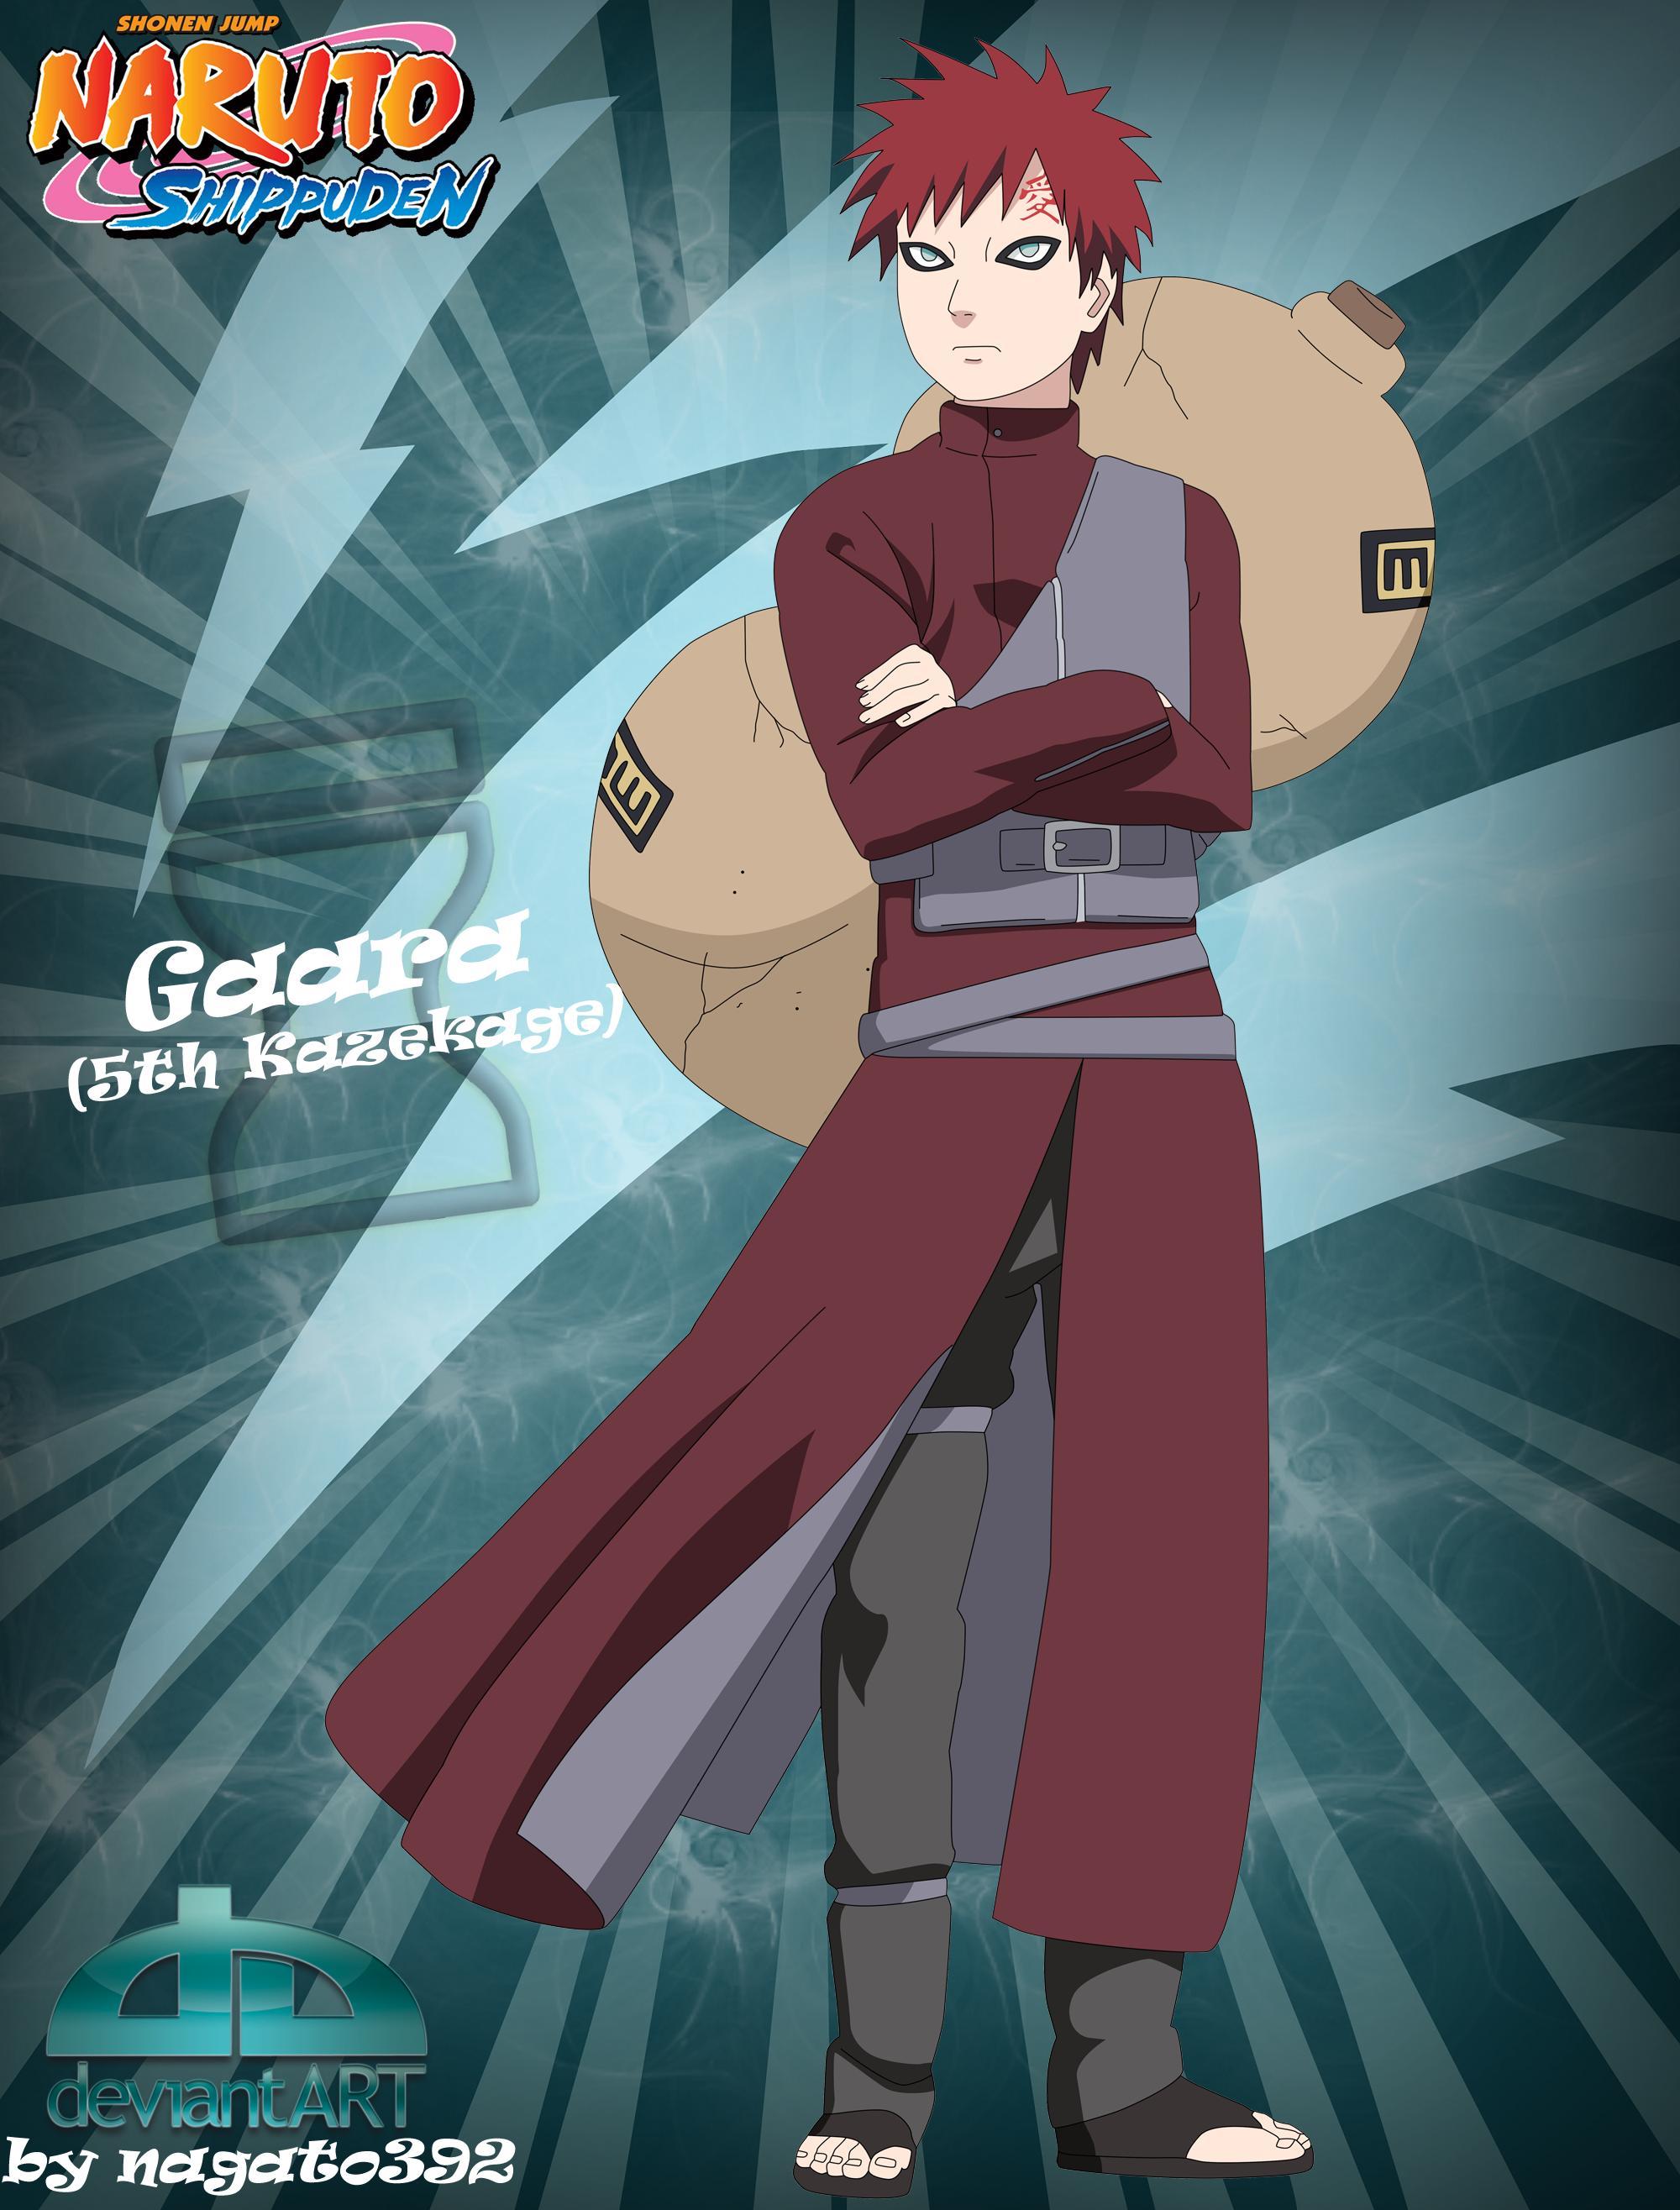 Gaara - NARUTO | page 9 of 18 - Zerochan Anime Image Board